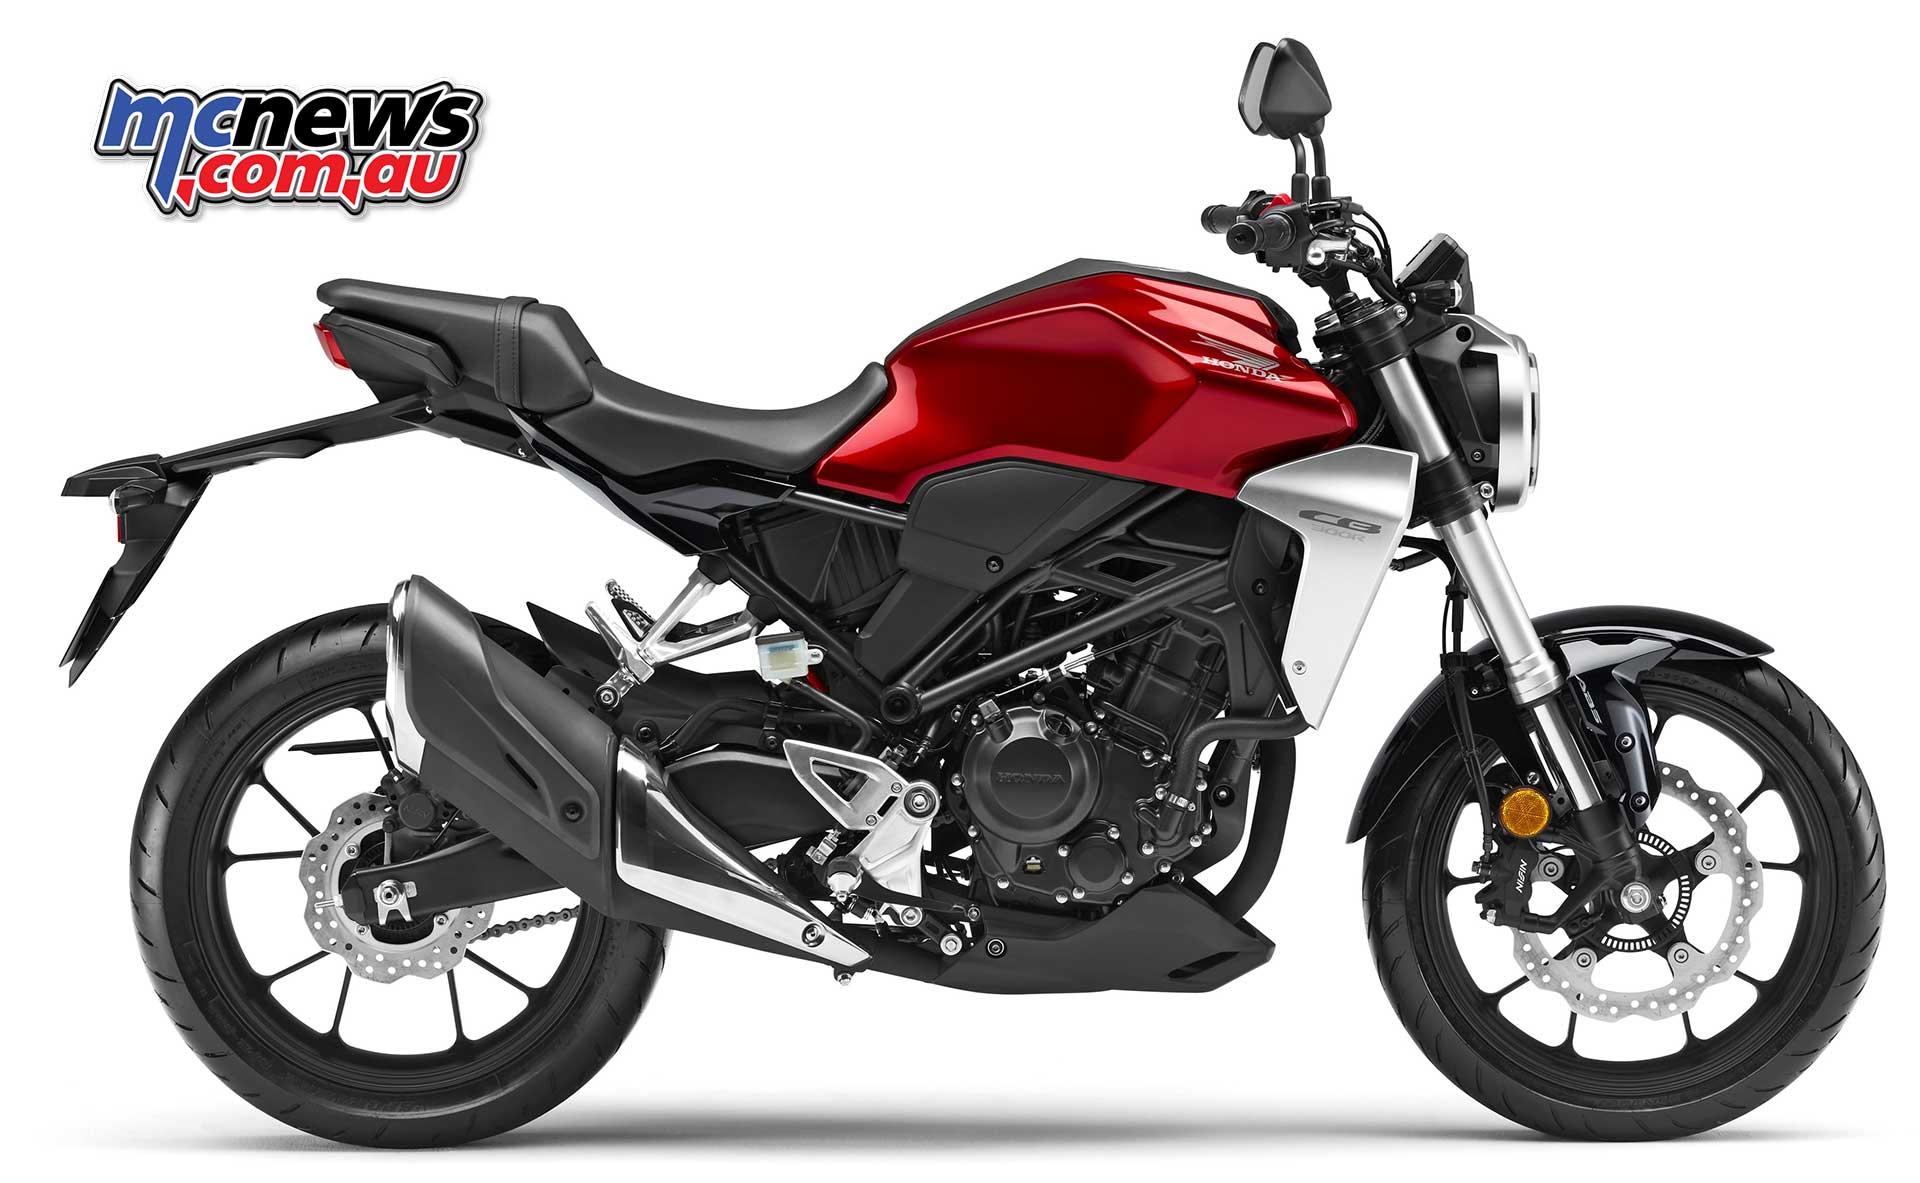 Honda New Vehicle 2018 Honda Cb300r 143kg Wet Usd Forks